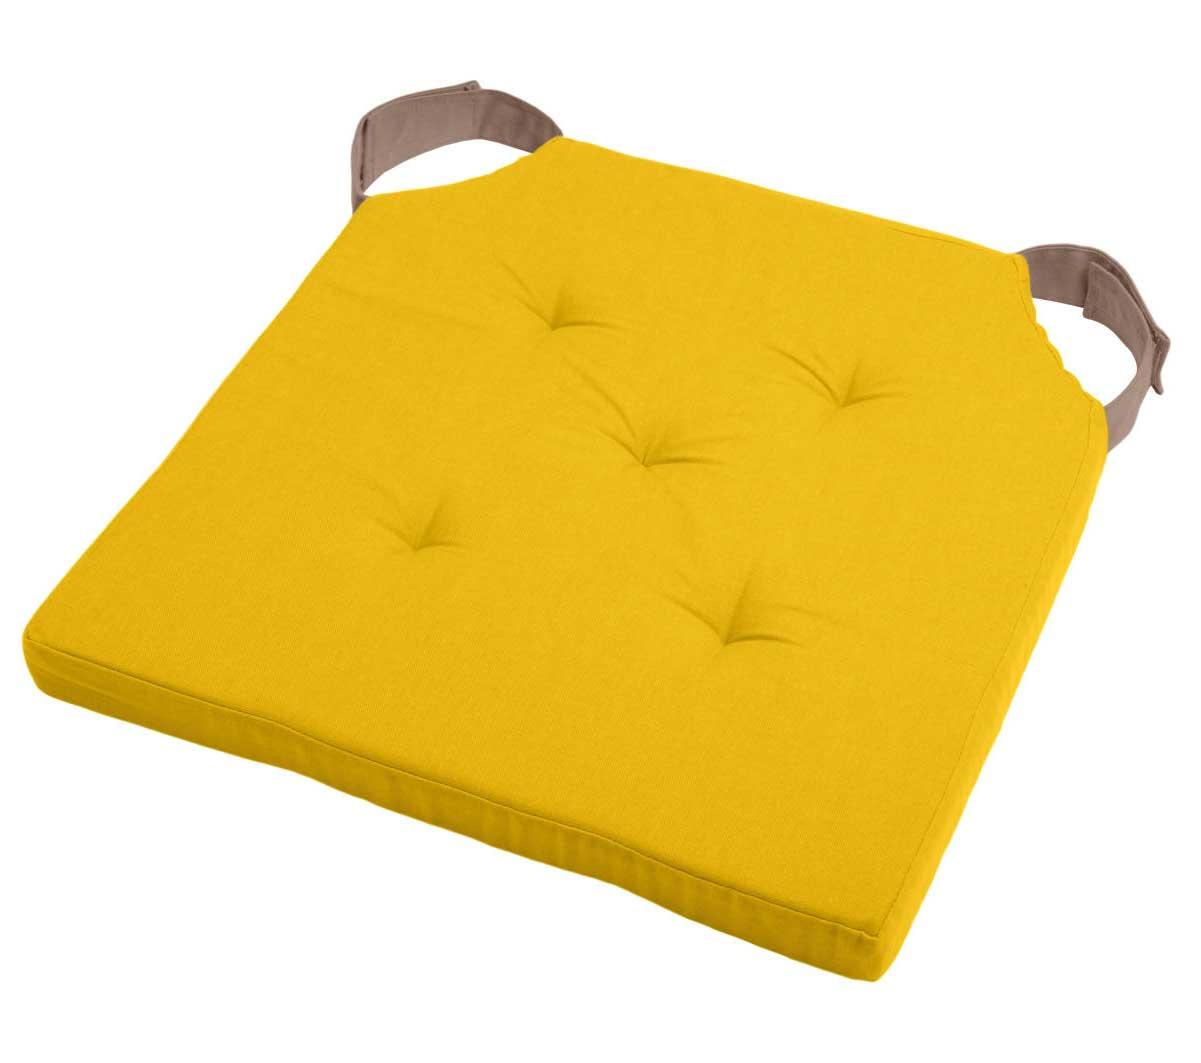 Coussin de Chaise Bicolore  (Moutarde/Taupe)